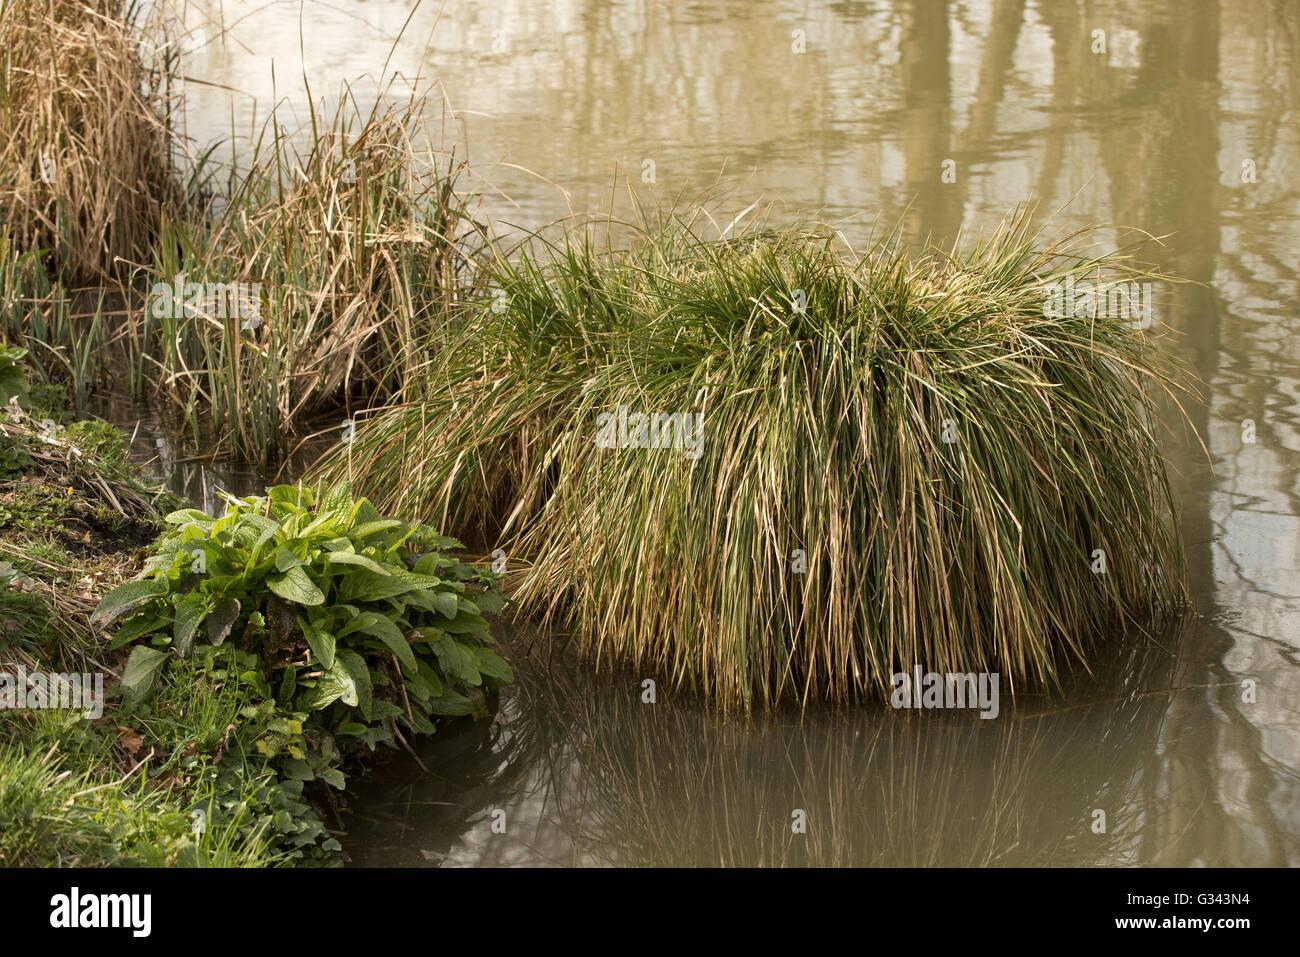 Overwintering tussocks of black sedge, Carex nigra, a perennial plant of European wetlands, March - Stock Image